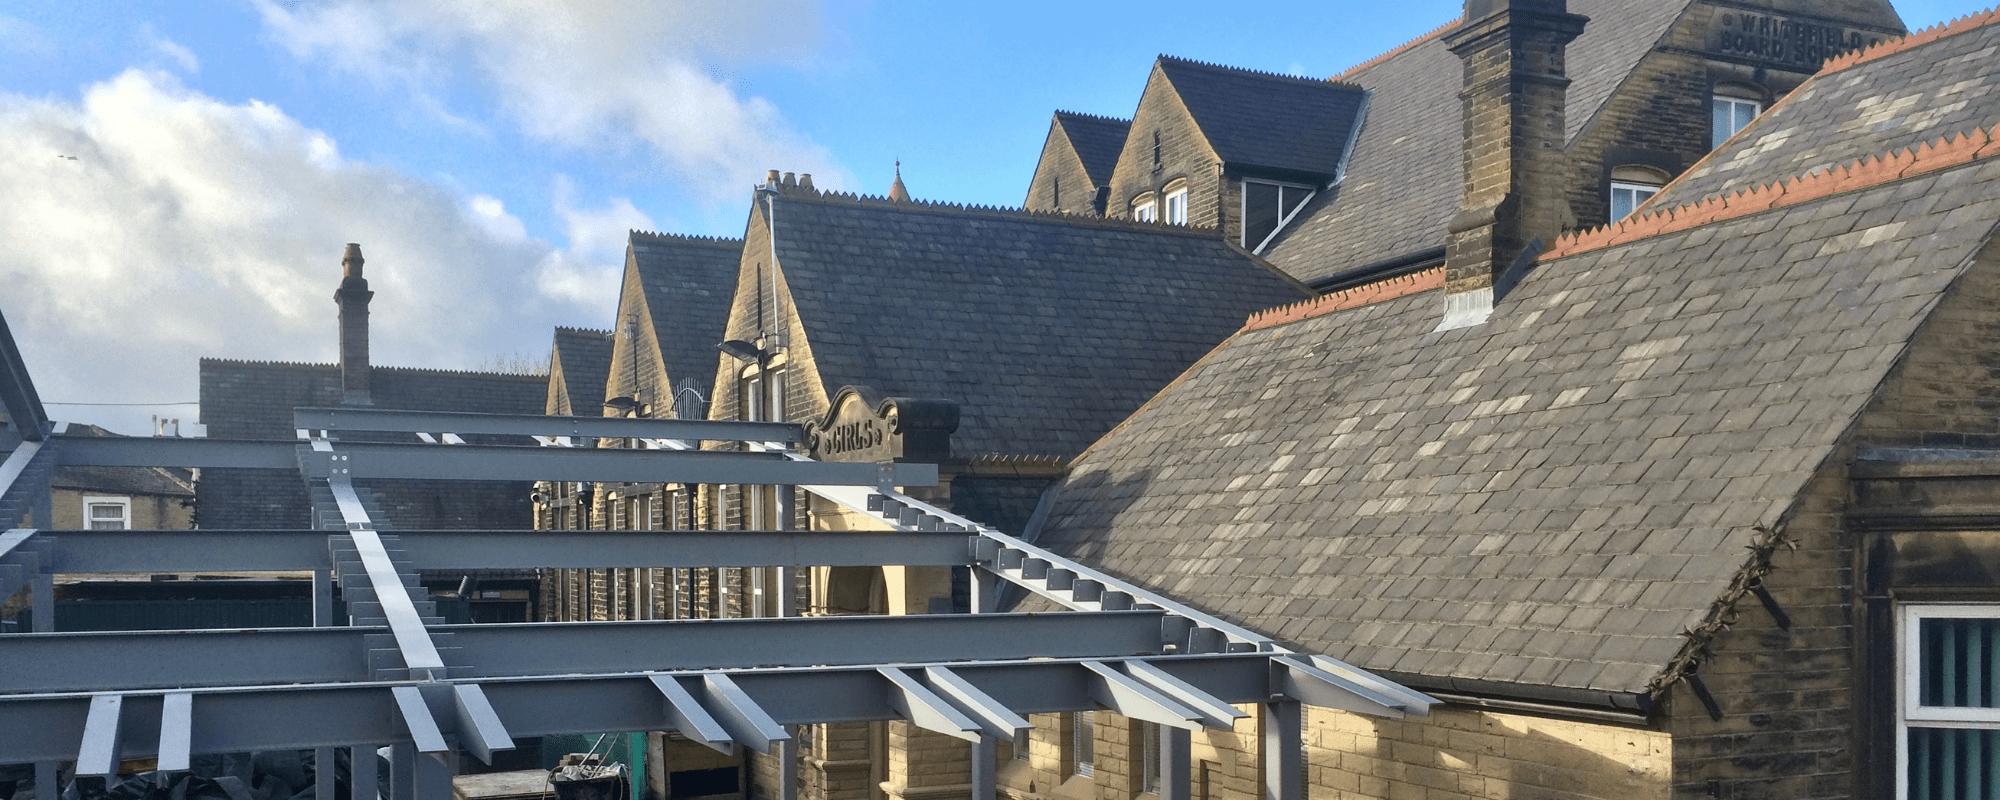 lomeshaye-roof